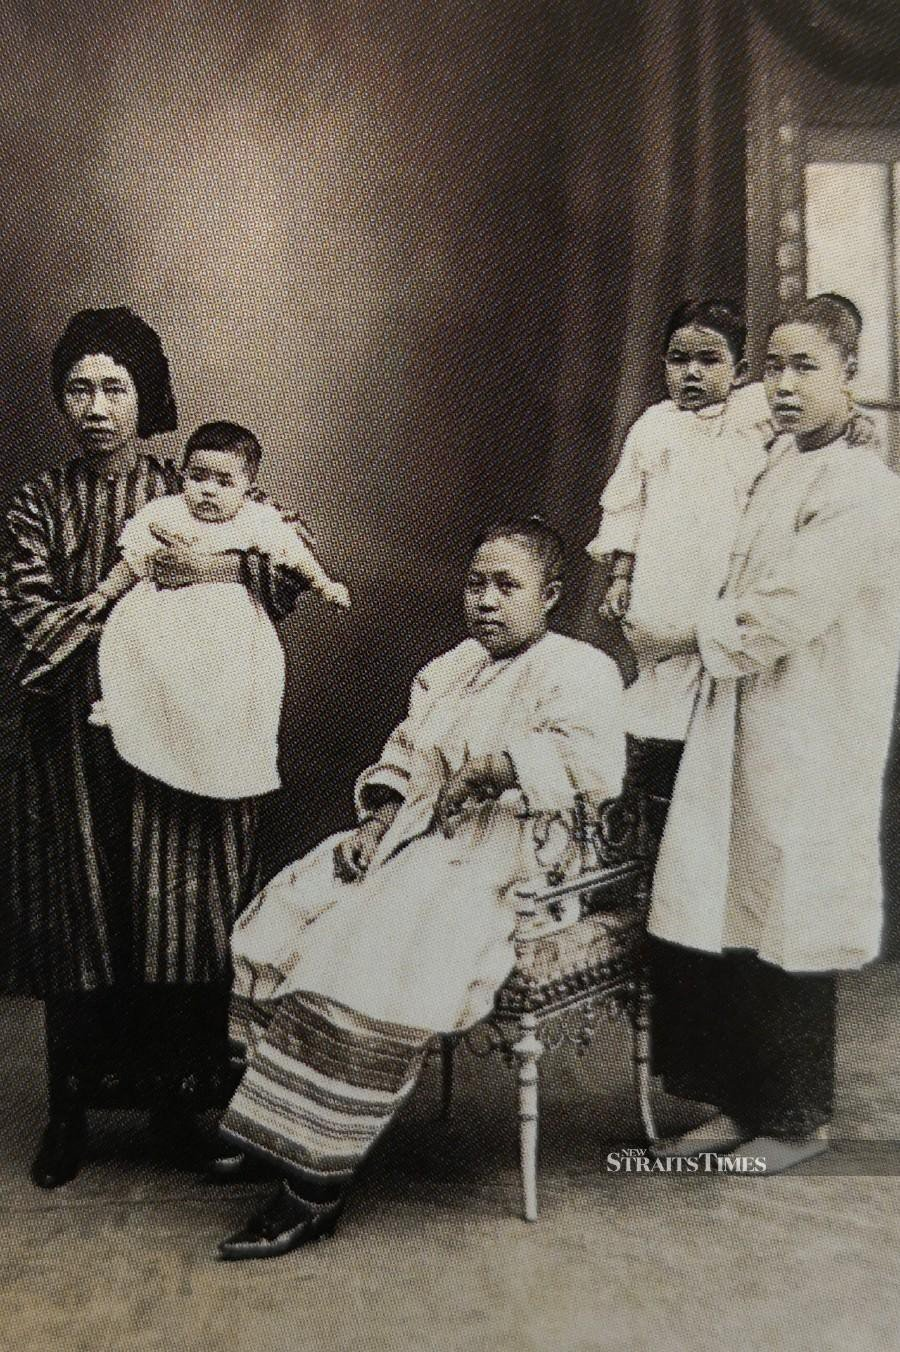 Early 20th century photograph showing Malay women dressed in baju kurung.